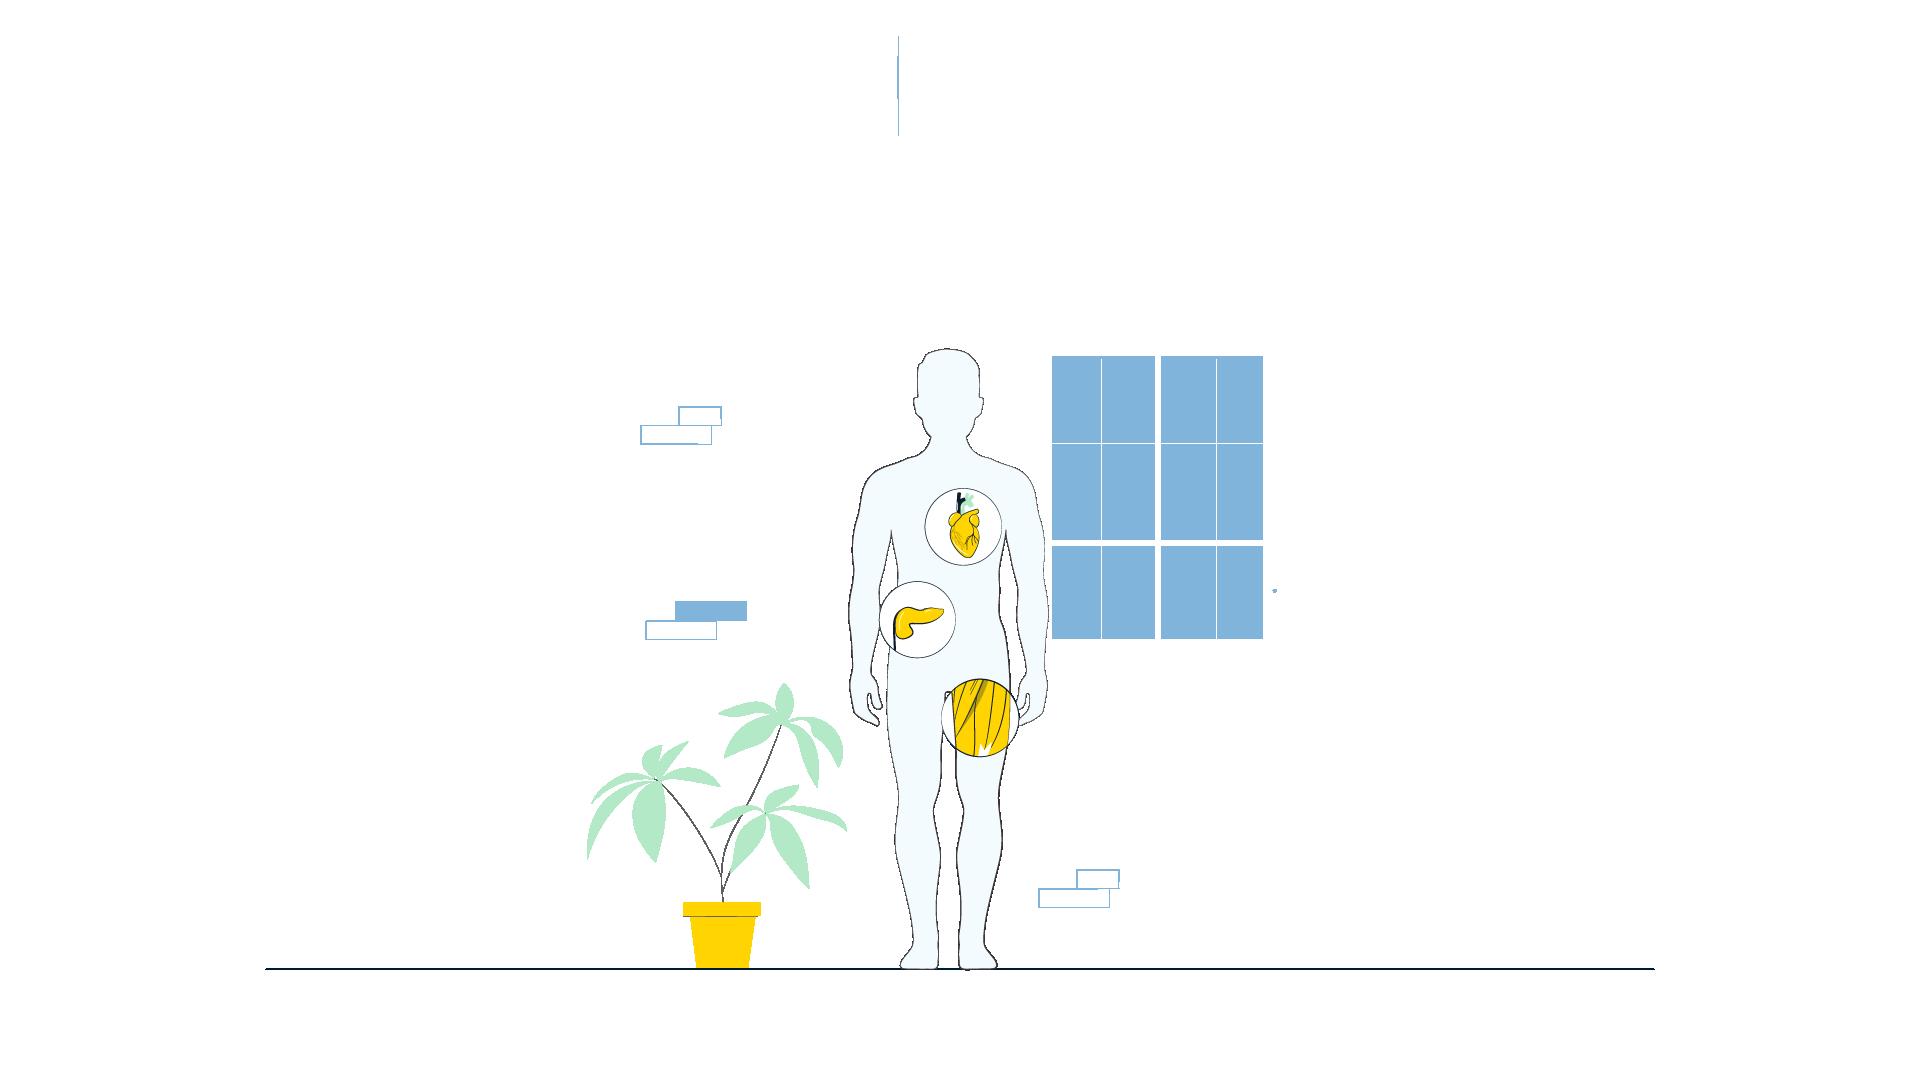 weefselniveau cvg